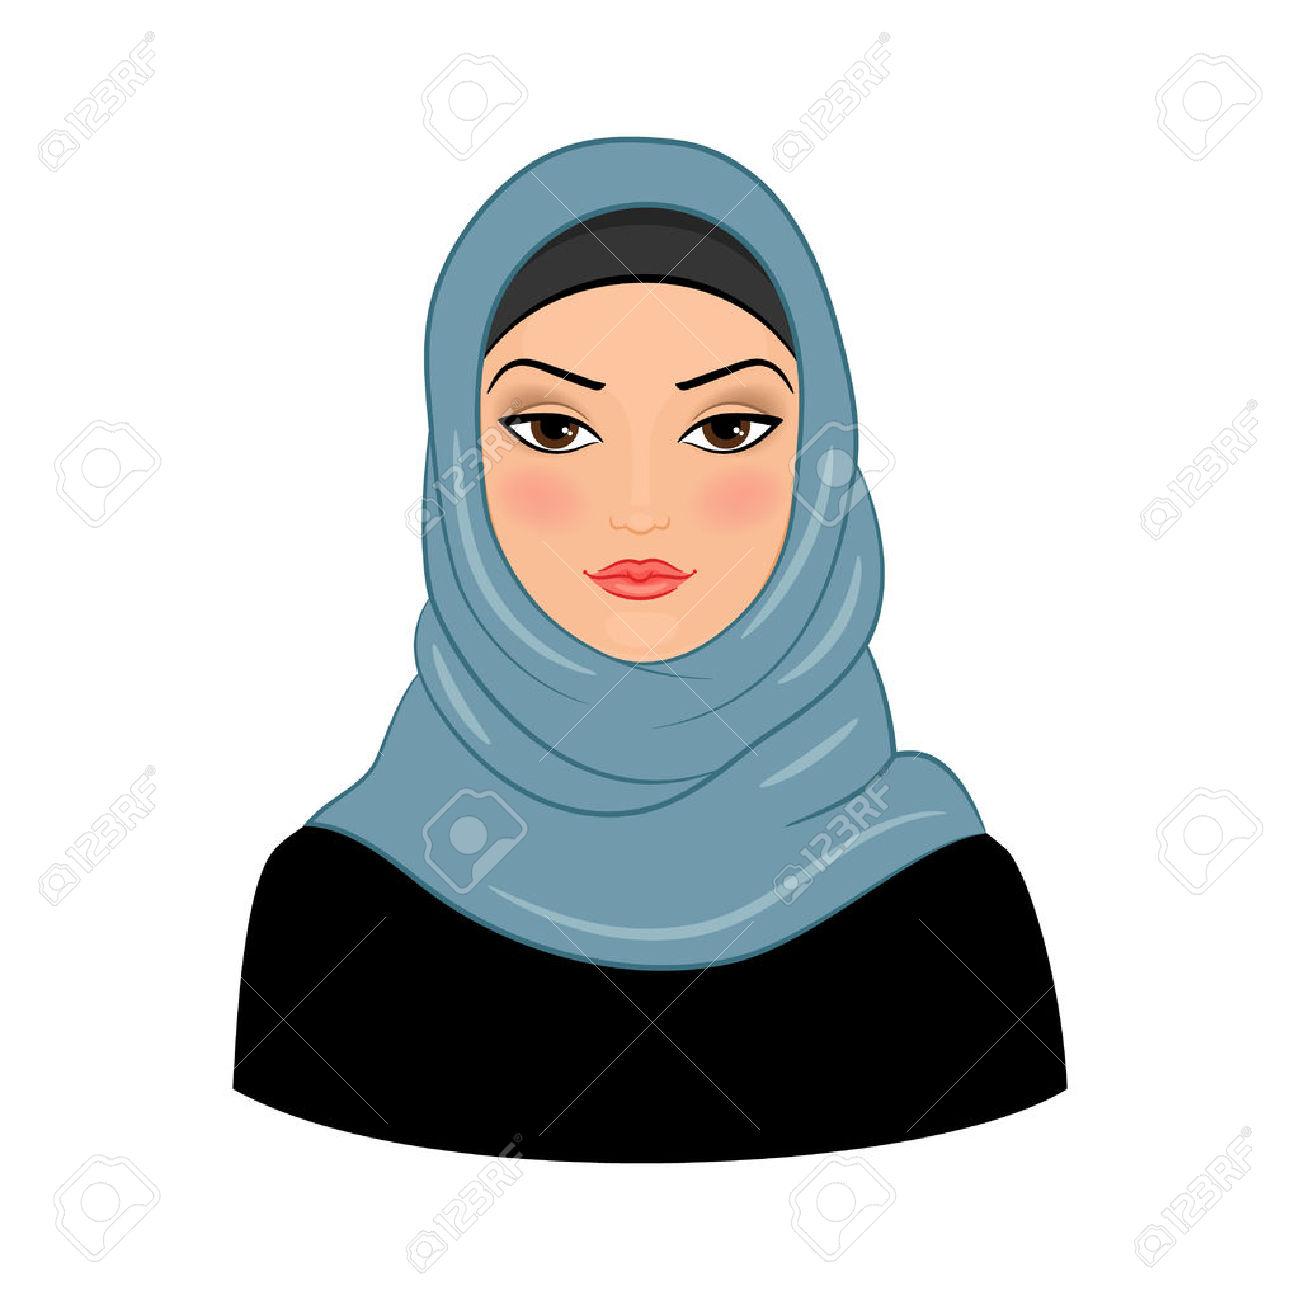 Free muslim woman clipart.